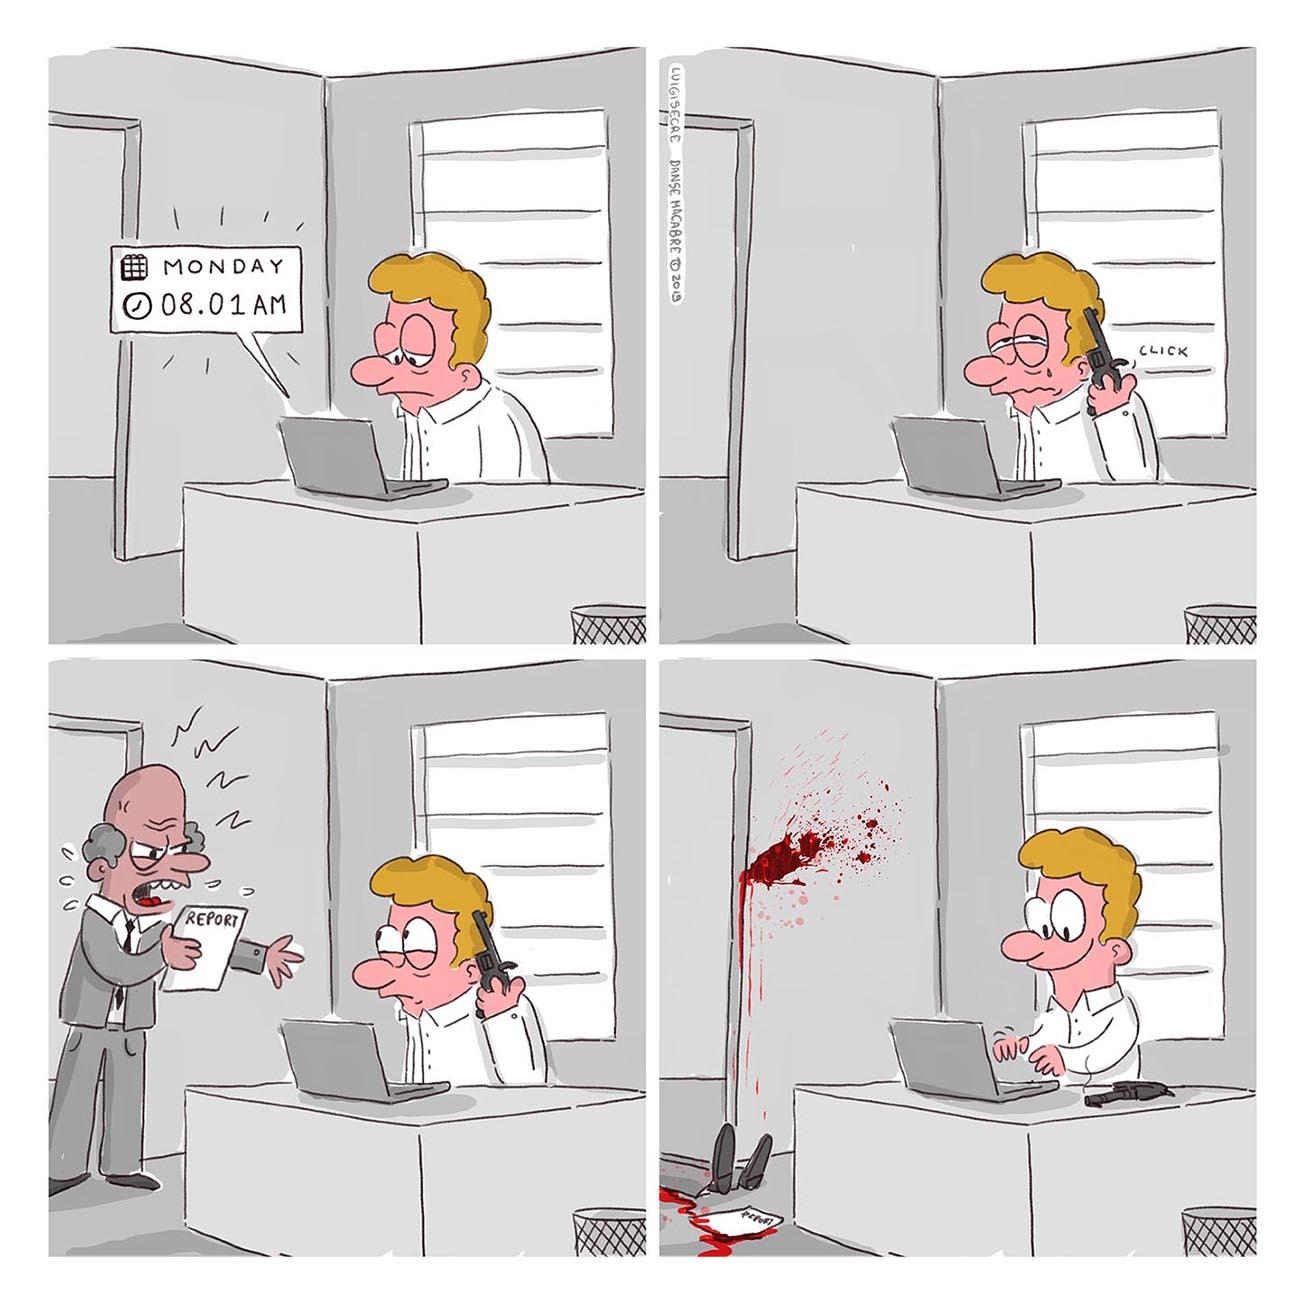 Contenuti_Low_Res_Luigi_Segre_Cartoons_2019_Danse_Macabre_14.jpg